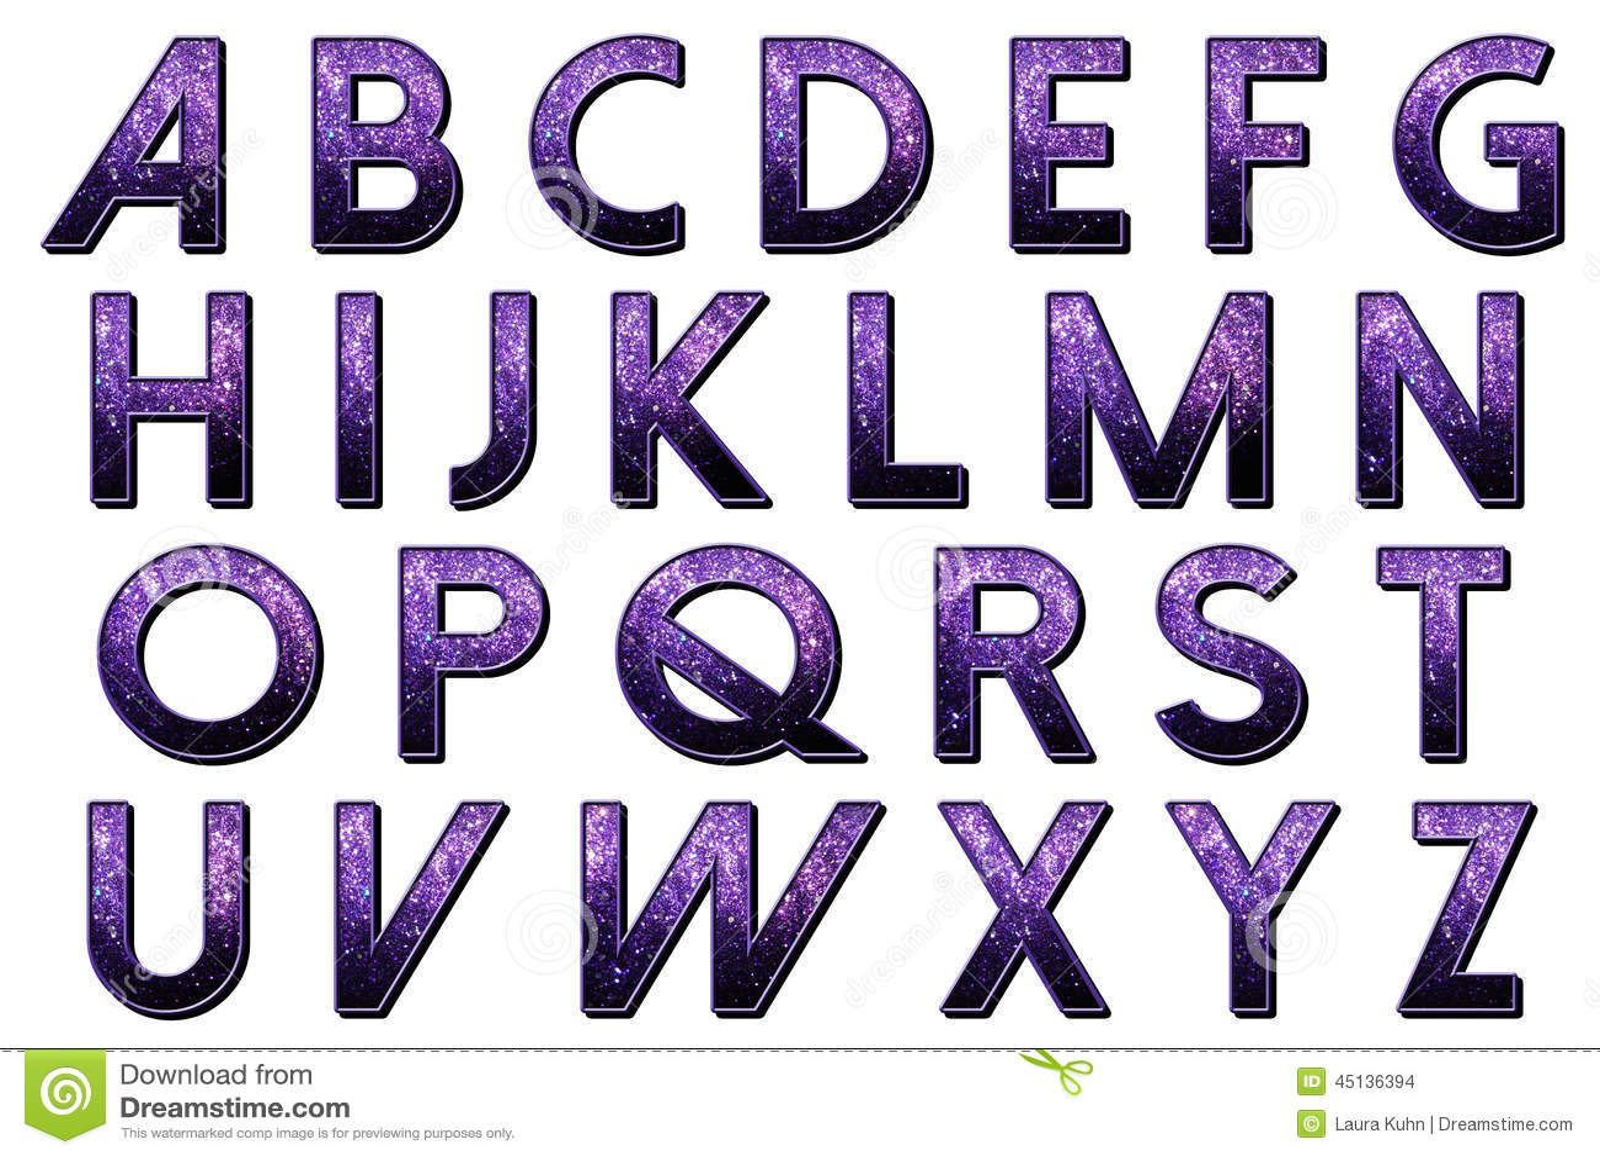 How to scrapbook letters - Digital Scrapbook Alphabet Dolce Vita